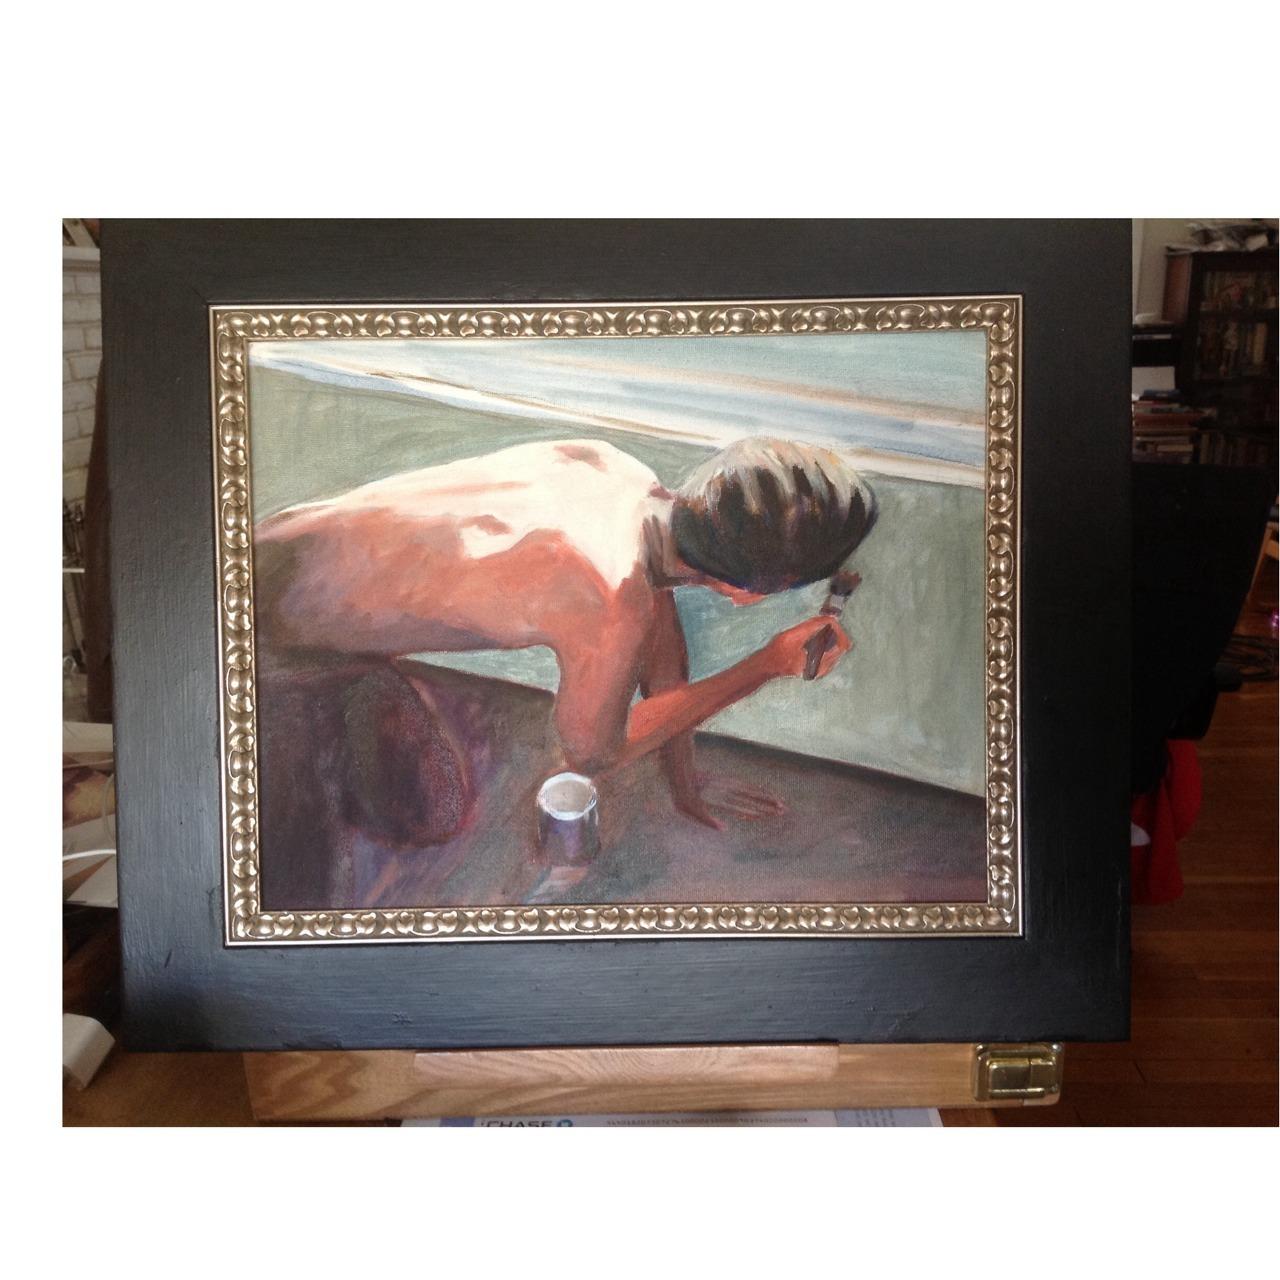 "Refurbished thrift store frame $2:00 oil on canvas board 14""x11"" ""The painter Denmark "" Pete bridgstock #artistsontumblr"